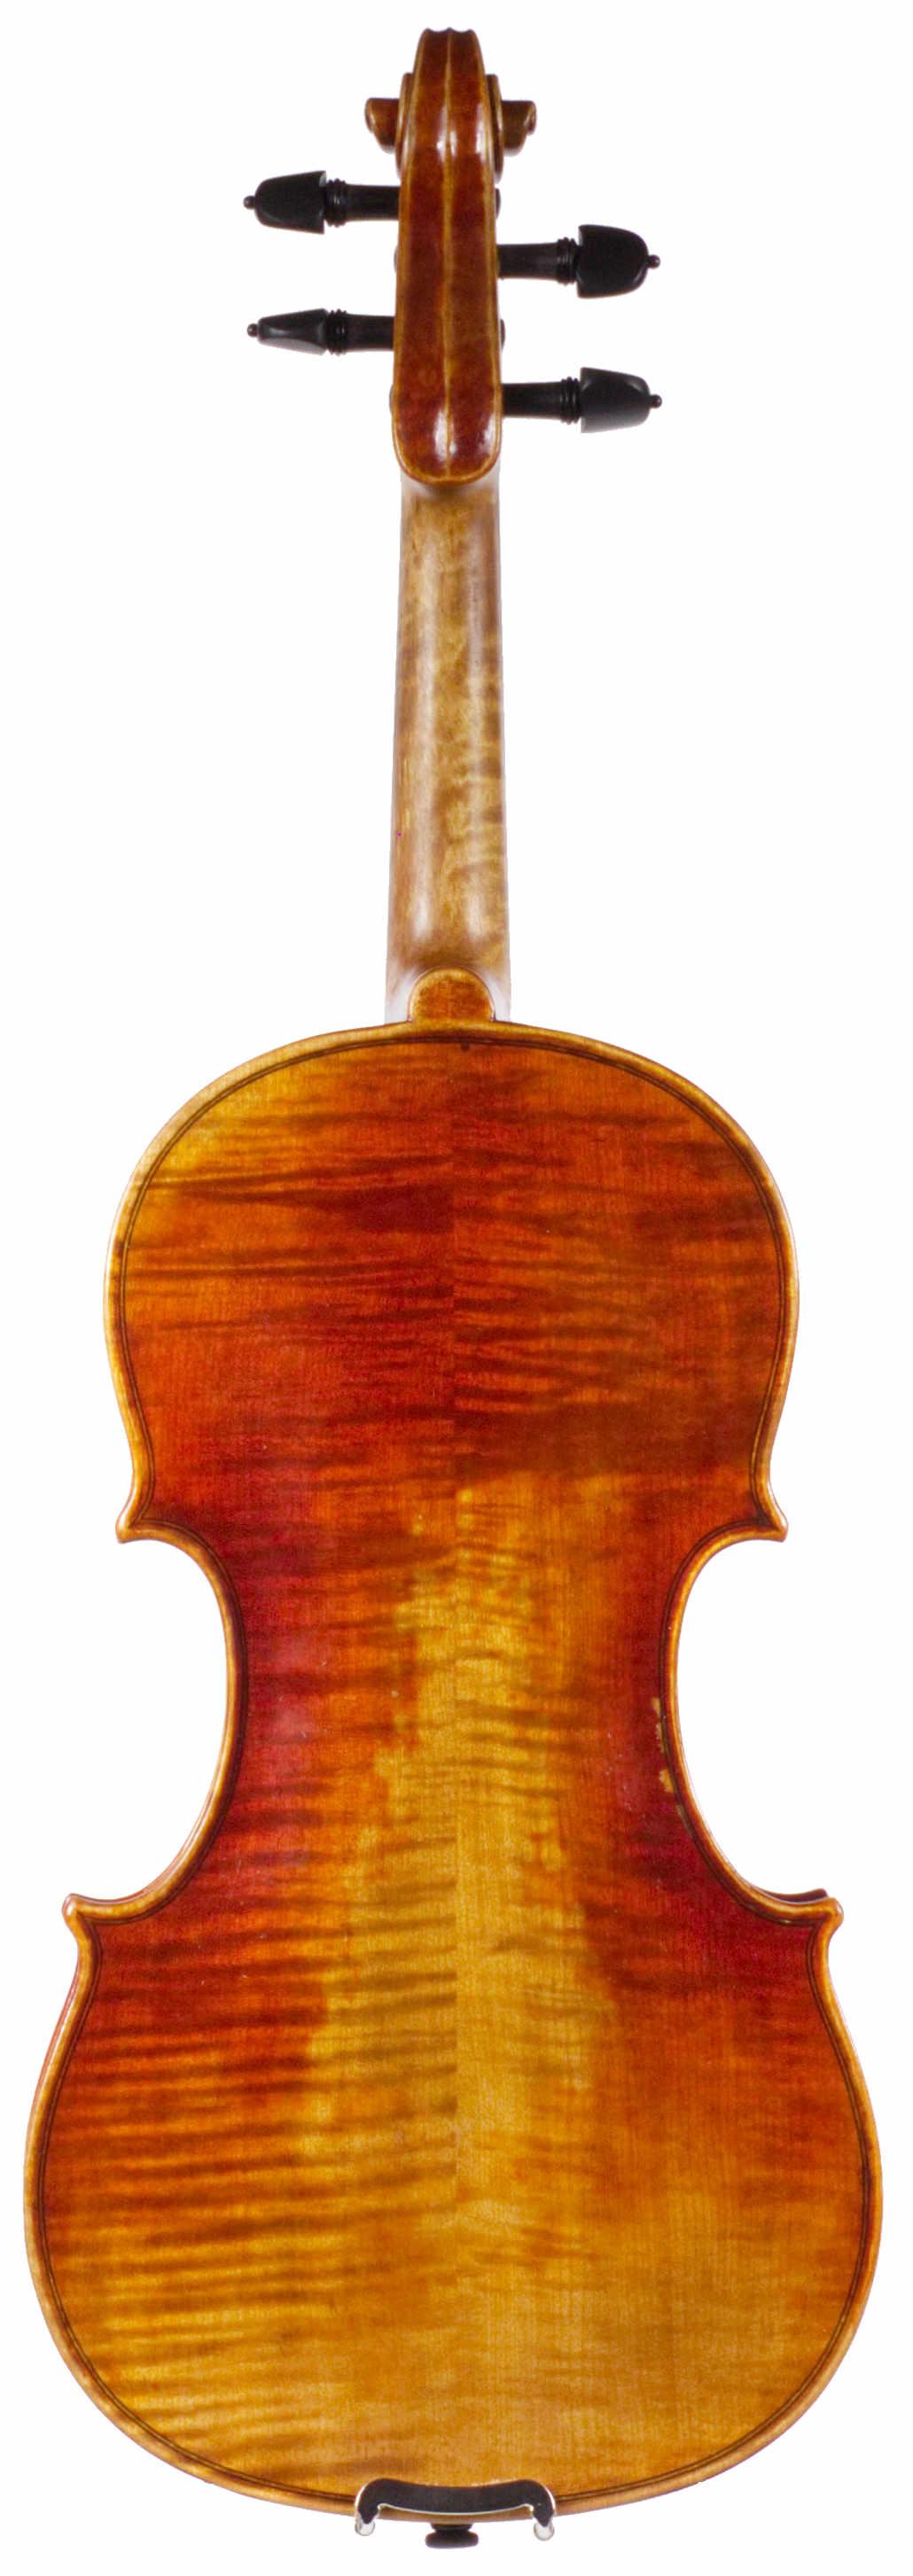 Haide Guarneri violin